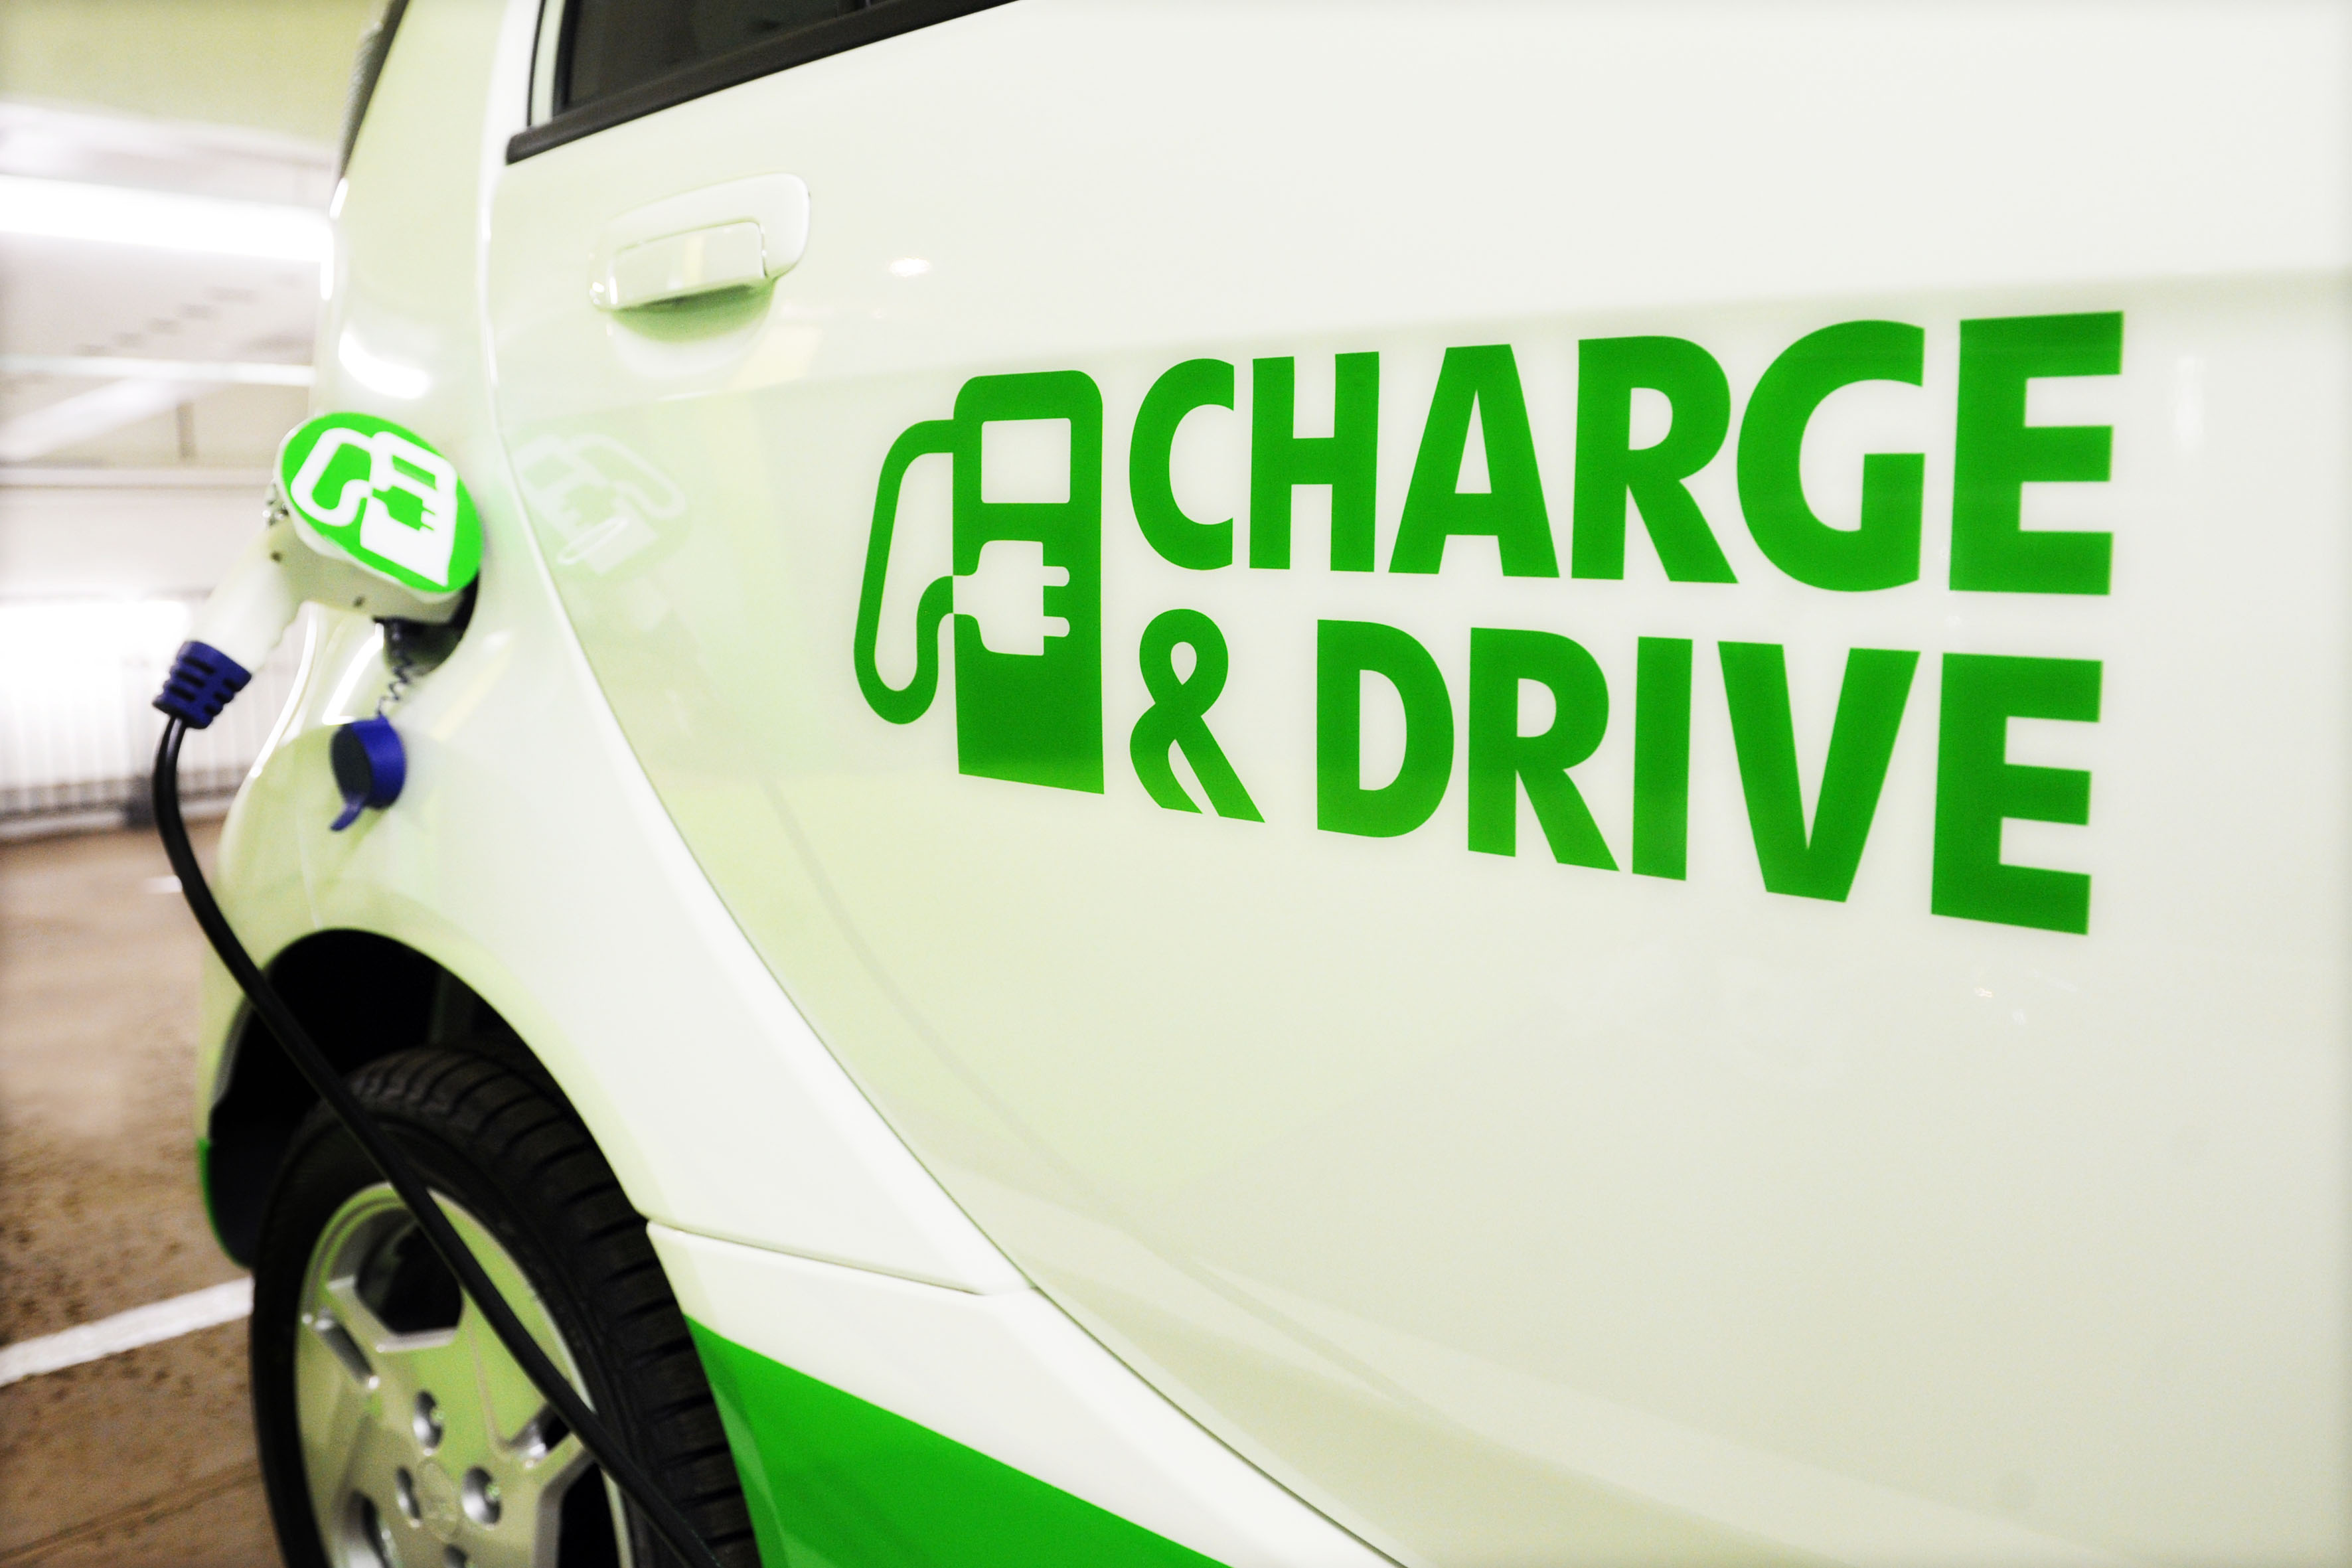 Charge & Drive - laddlösning som hanteras via mobilen